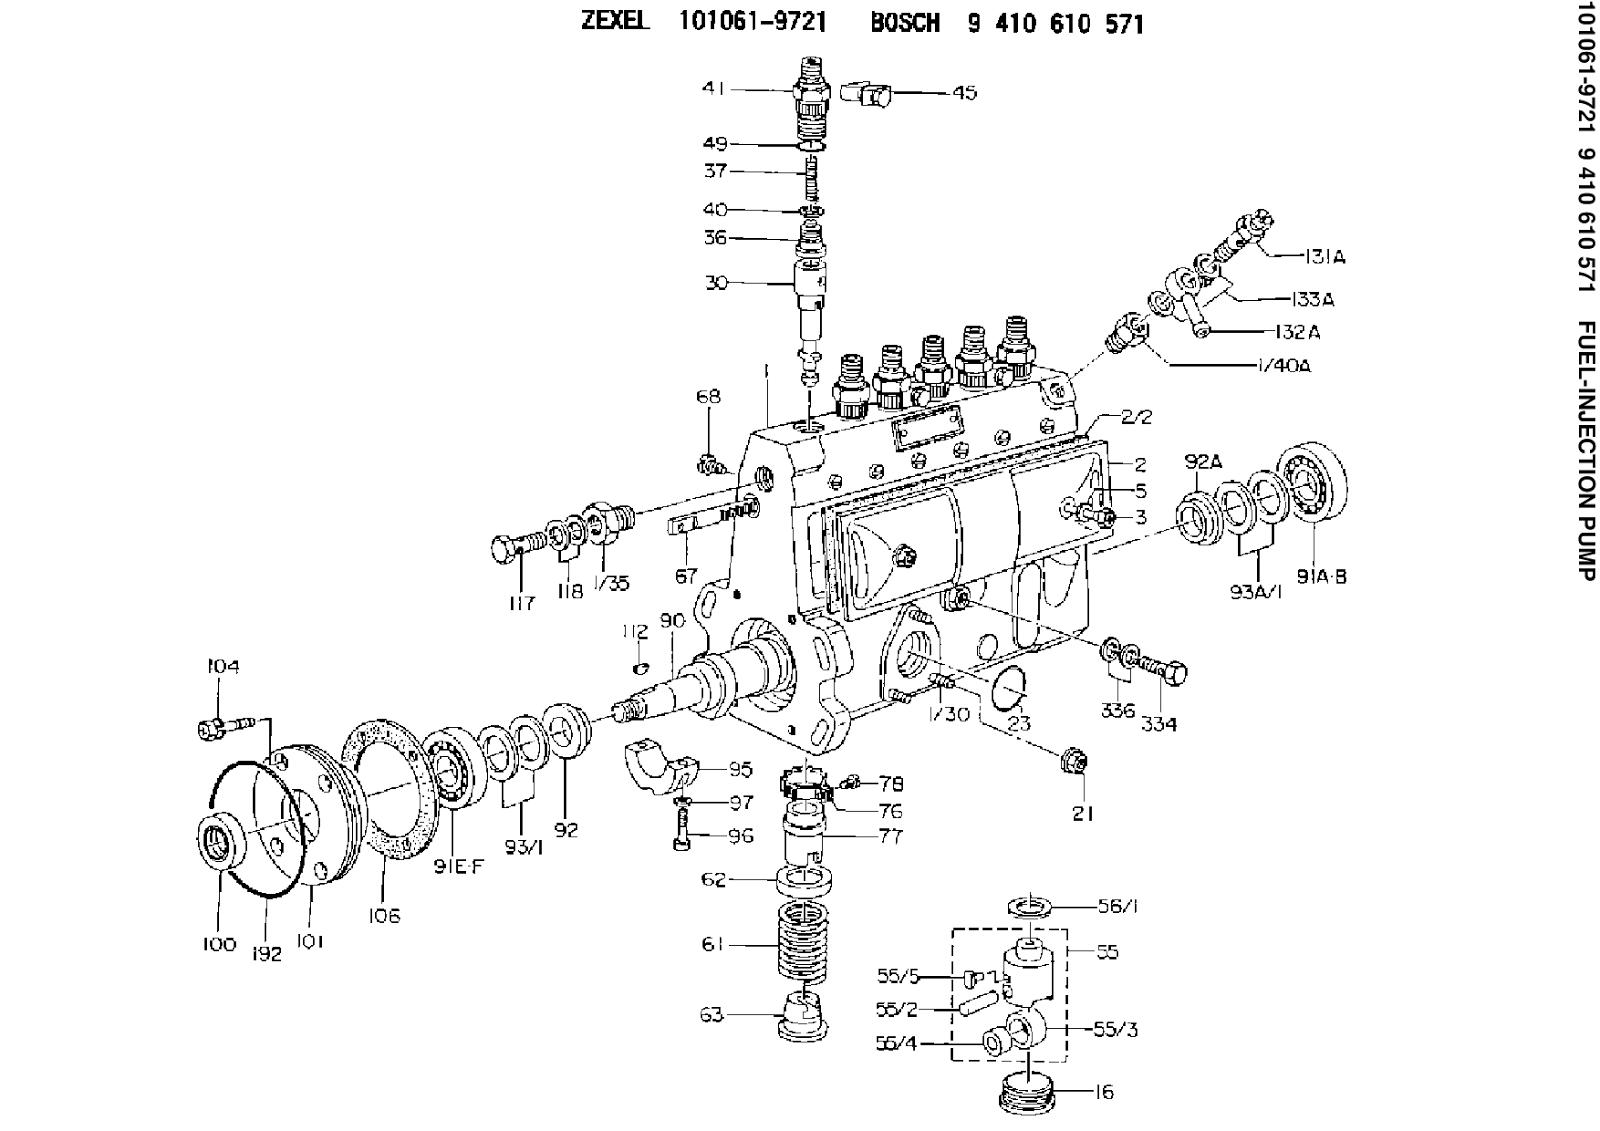 Zexel Injection Pump Wiring Diagram Electrical Diagrams Pin Lucas Cav On Pinterest Sparescode 9410610571 101061 9721 Fuel Kubota